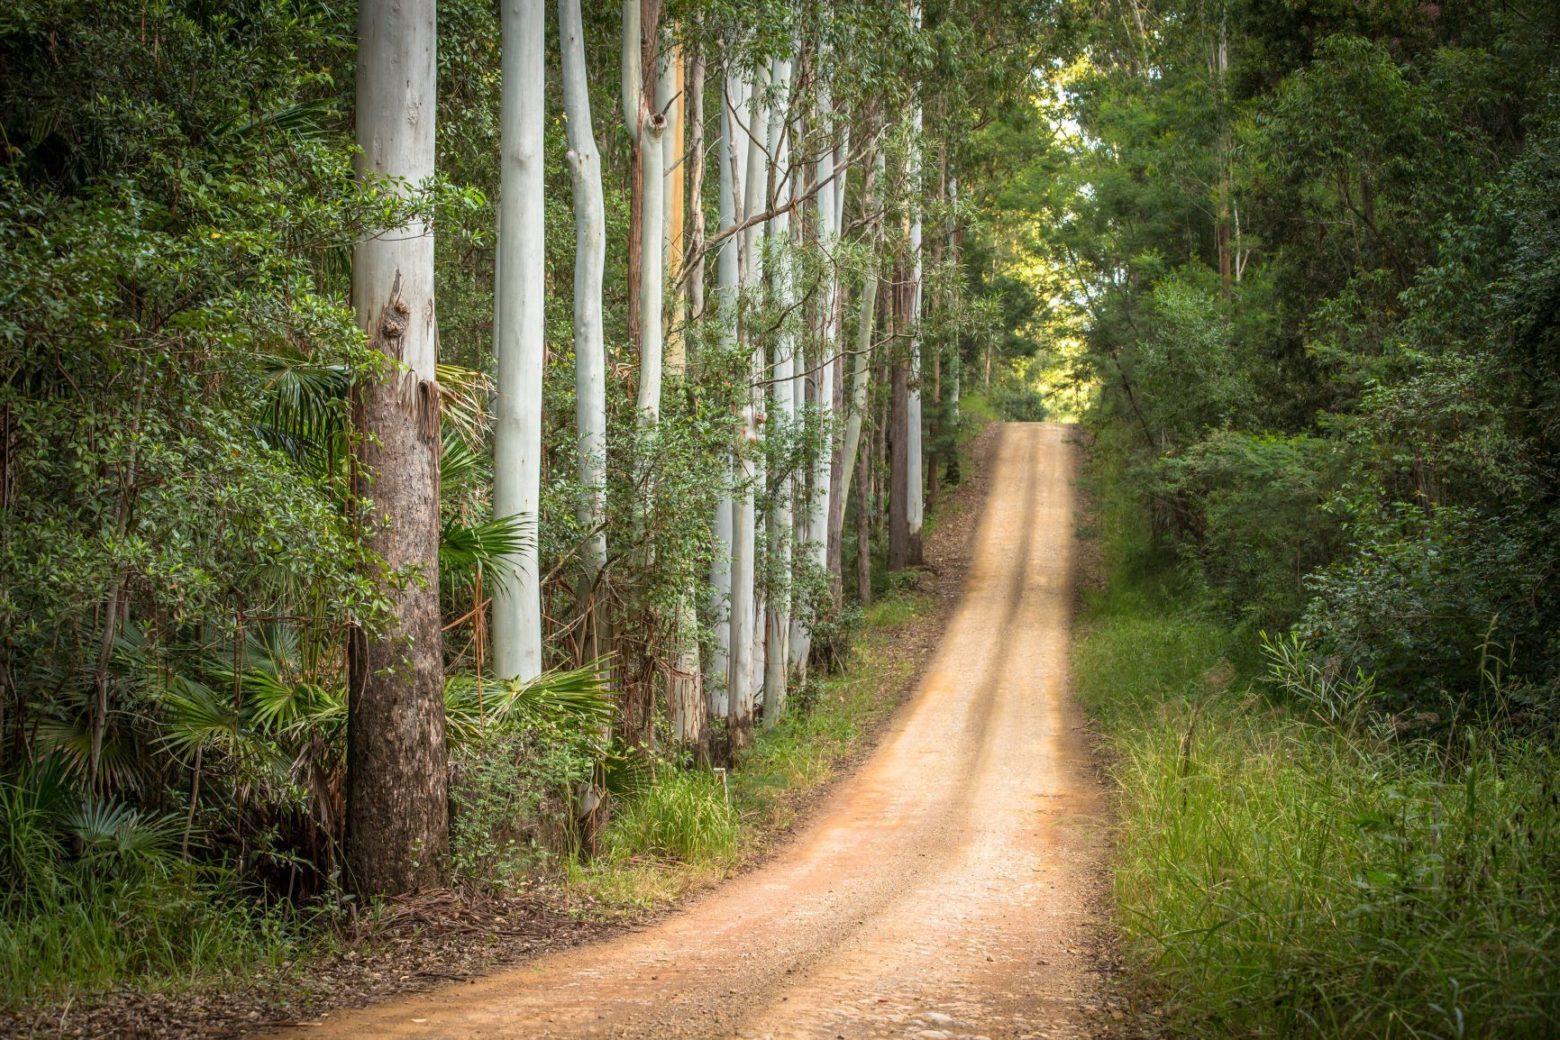 Whoota Whoota Lookout Road, Wallingat National Park